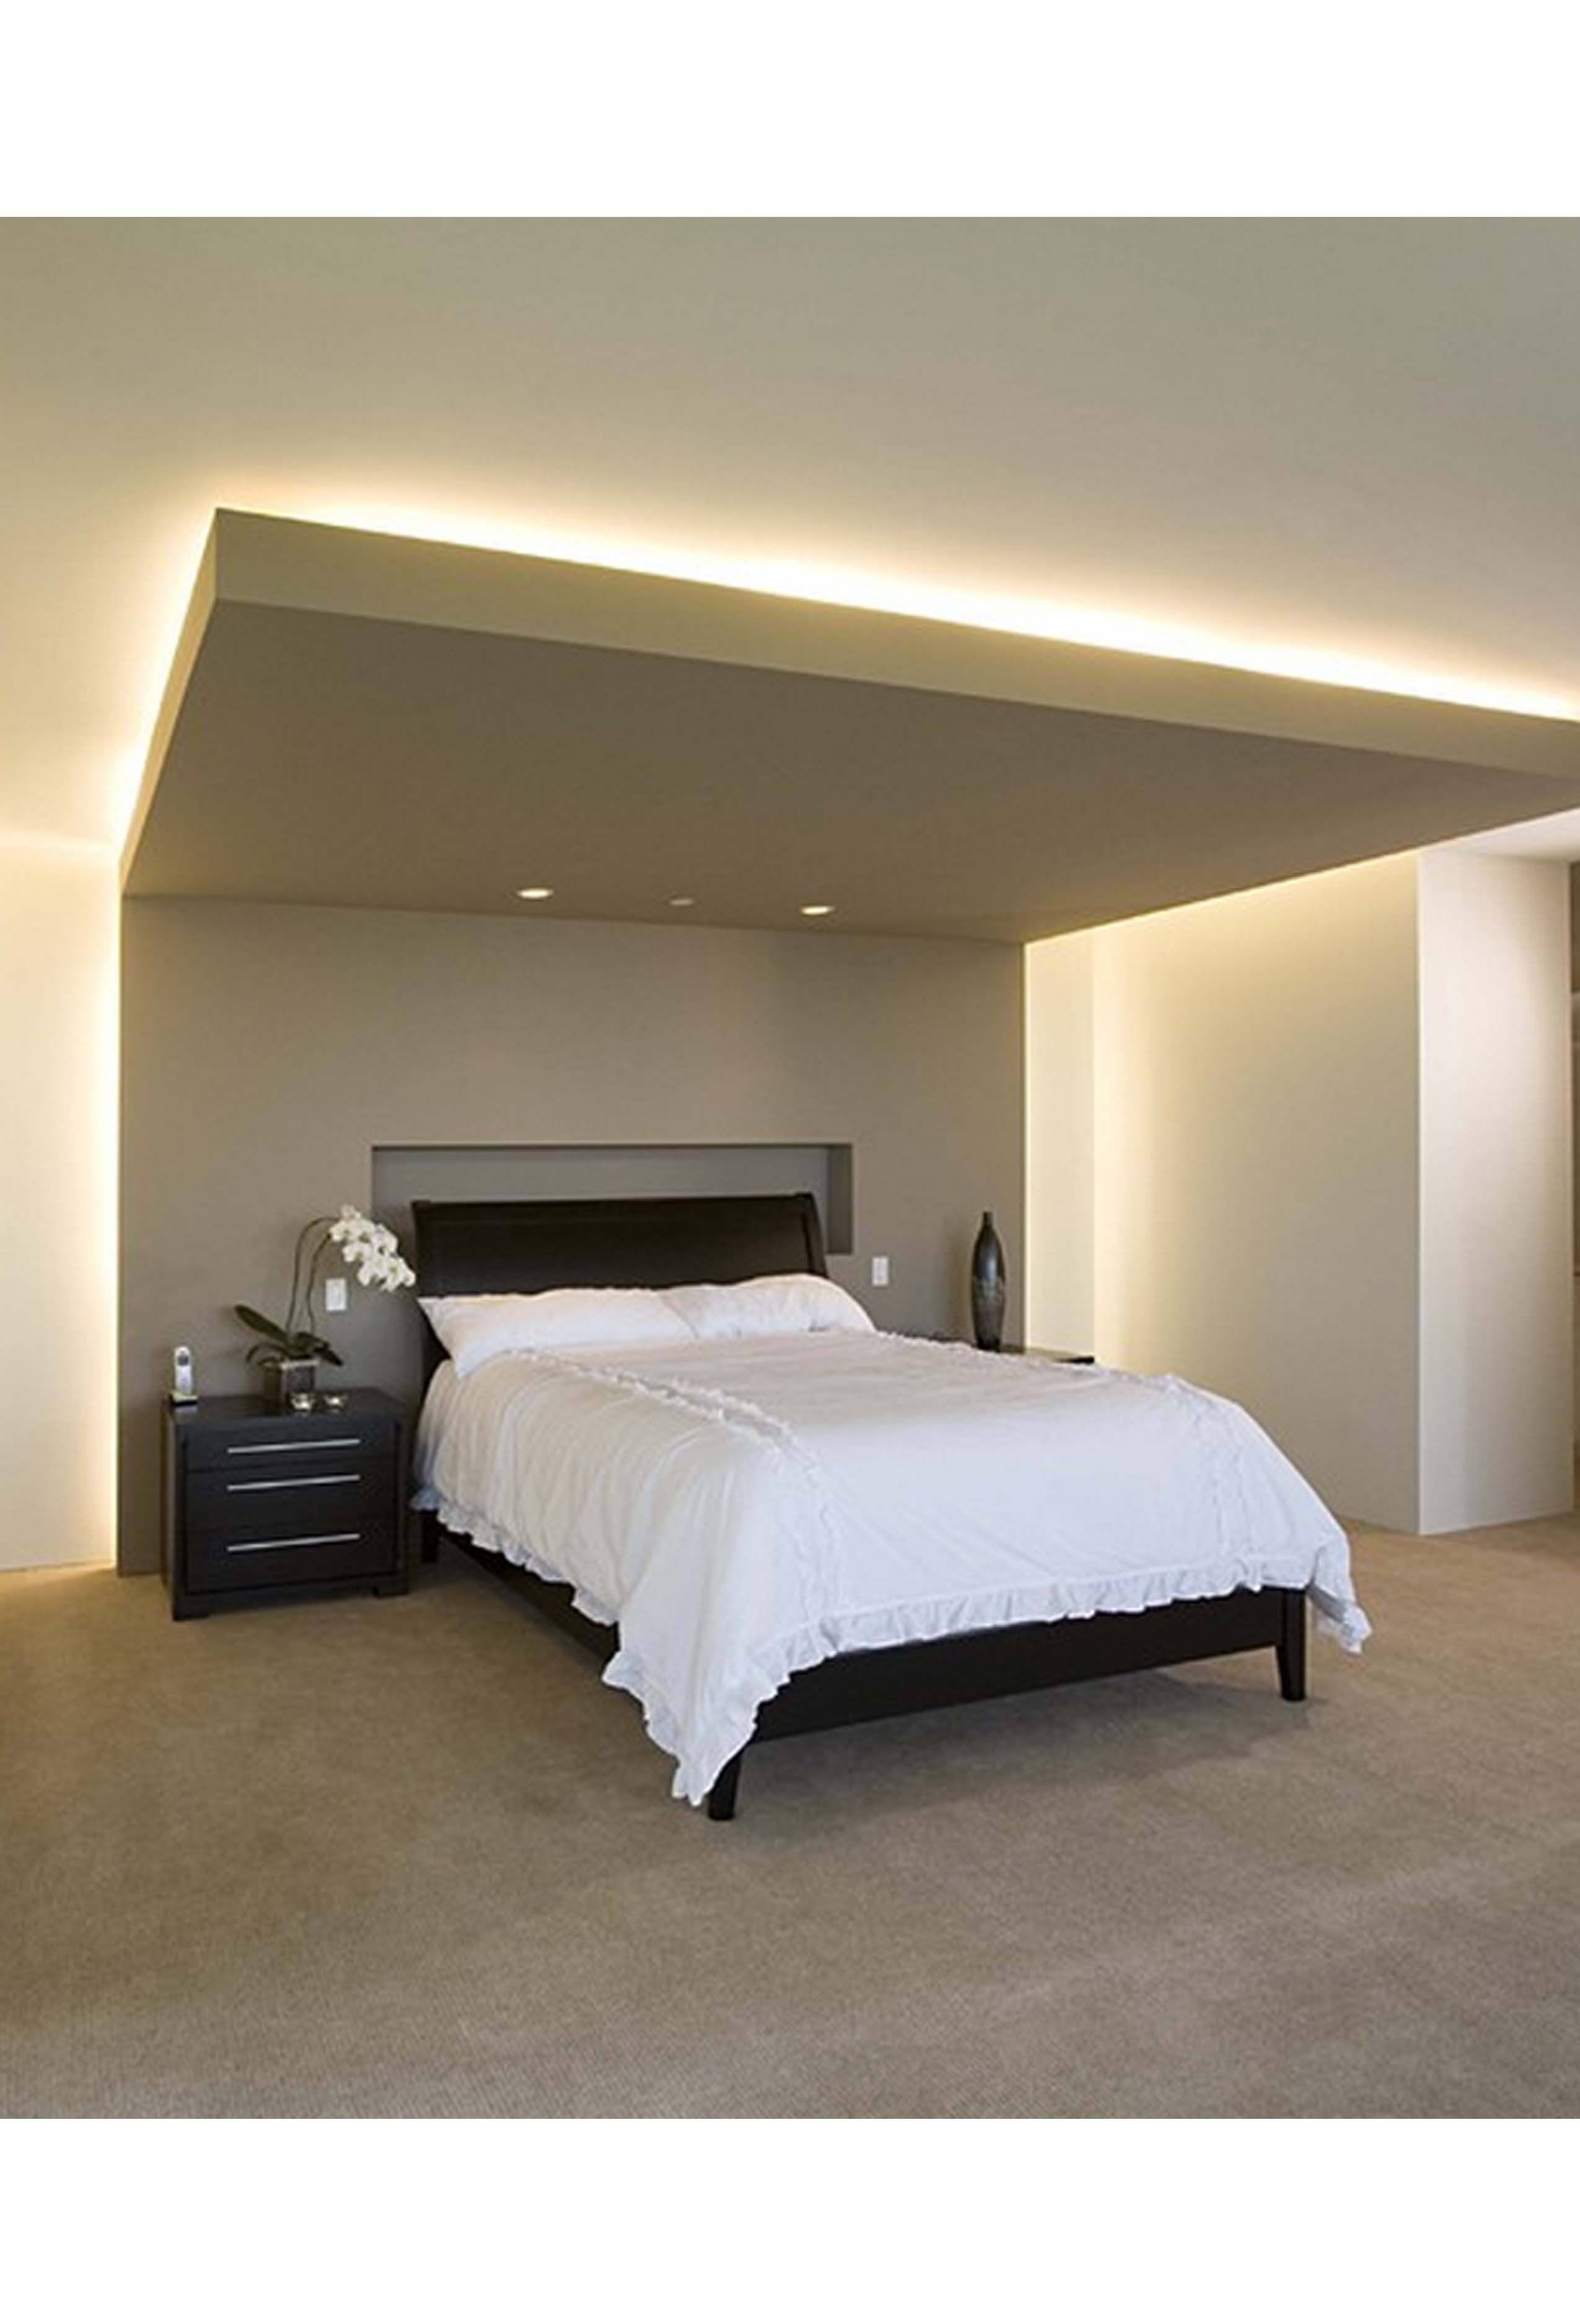 eclairage plafond suspendu fashion designs. Black Bedroom Furniture Sets. Home Design Ideas